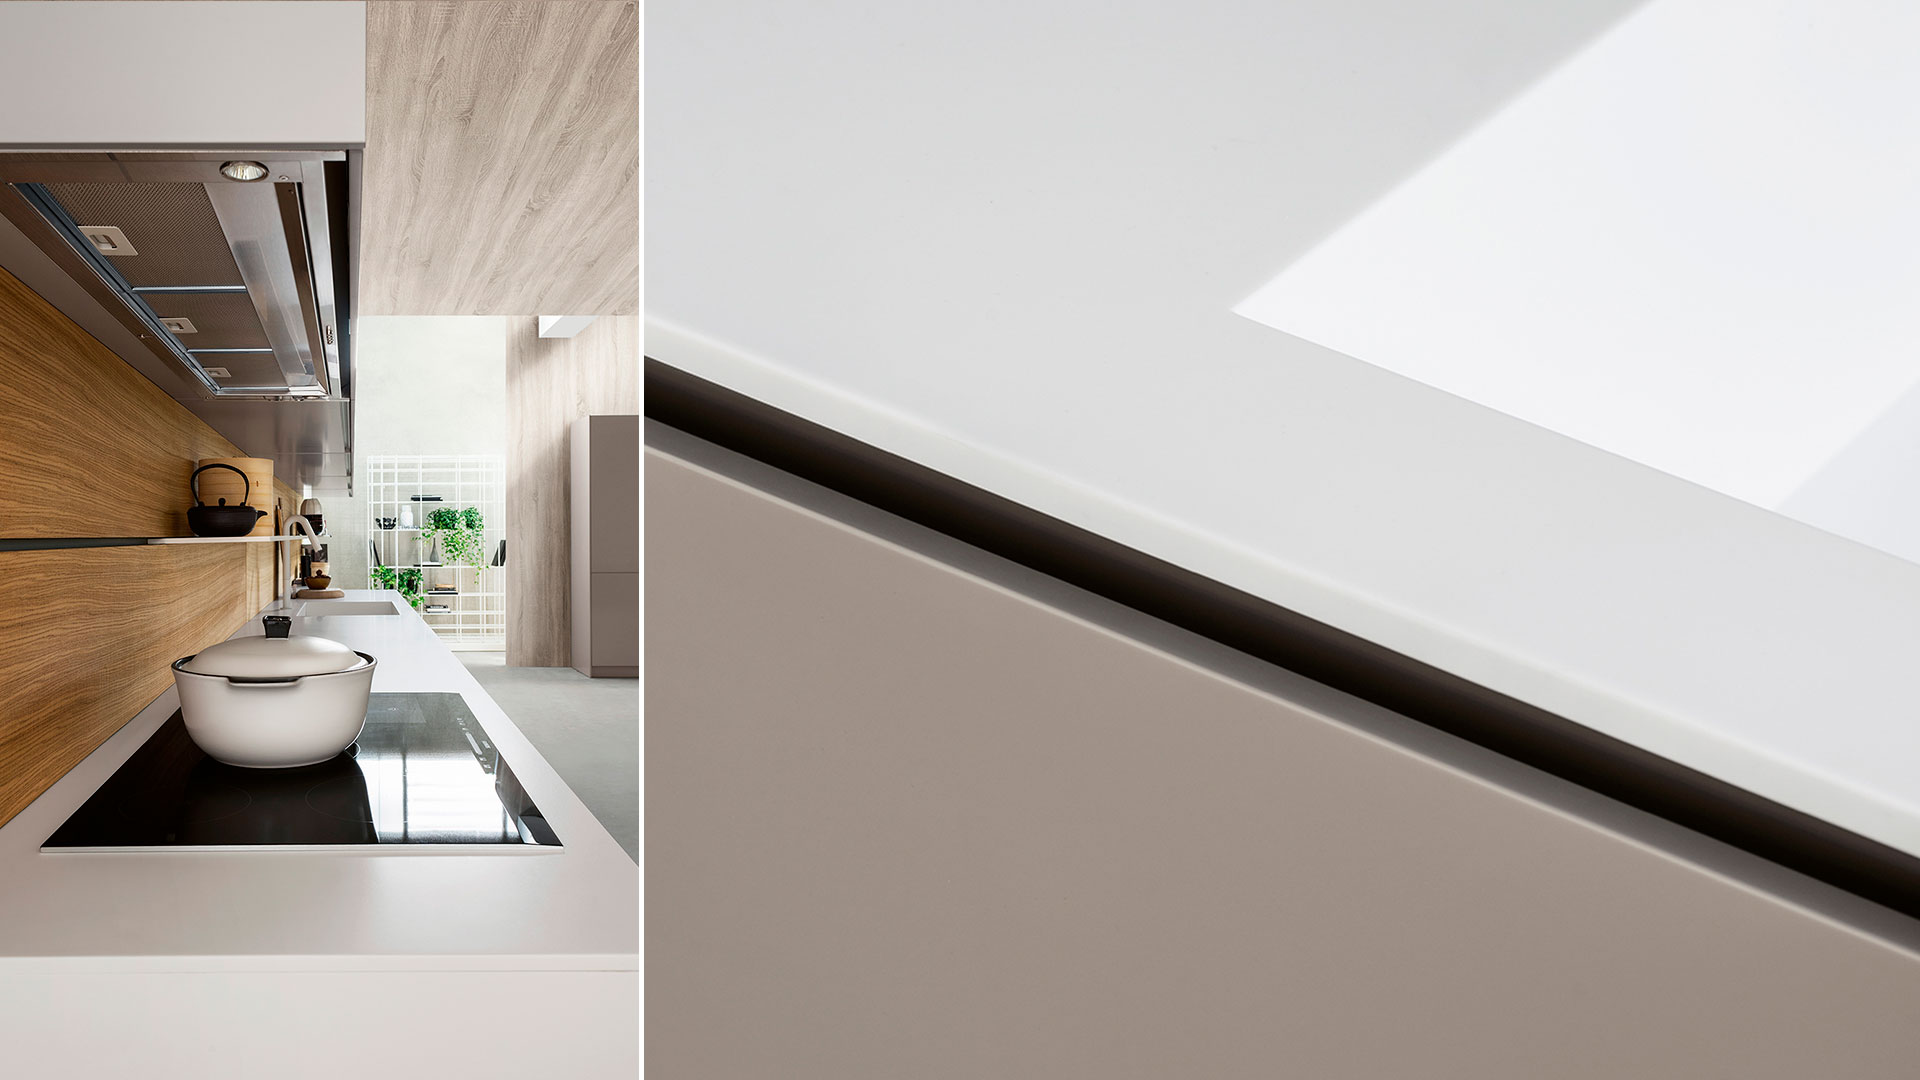 Cucina moderna freestanding in corian K6 | Collezioni Cucine 2018 TM Italia - TM_CAT_K6_003